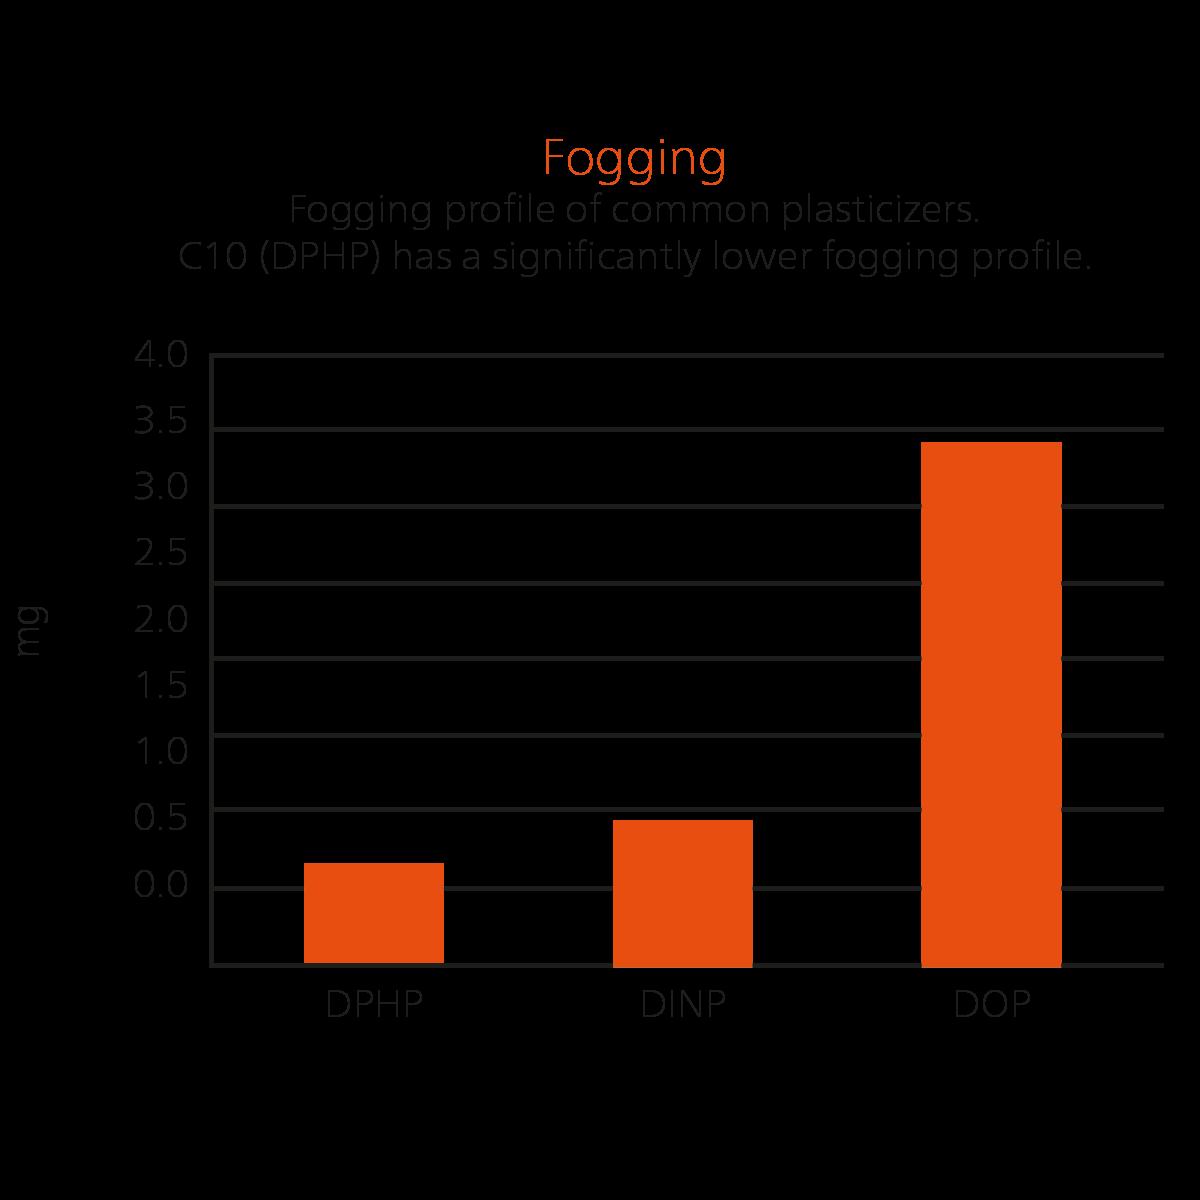 C10 plasticizer Emoltene is known for aniti-fogging capabilities